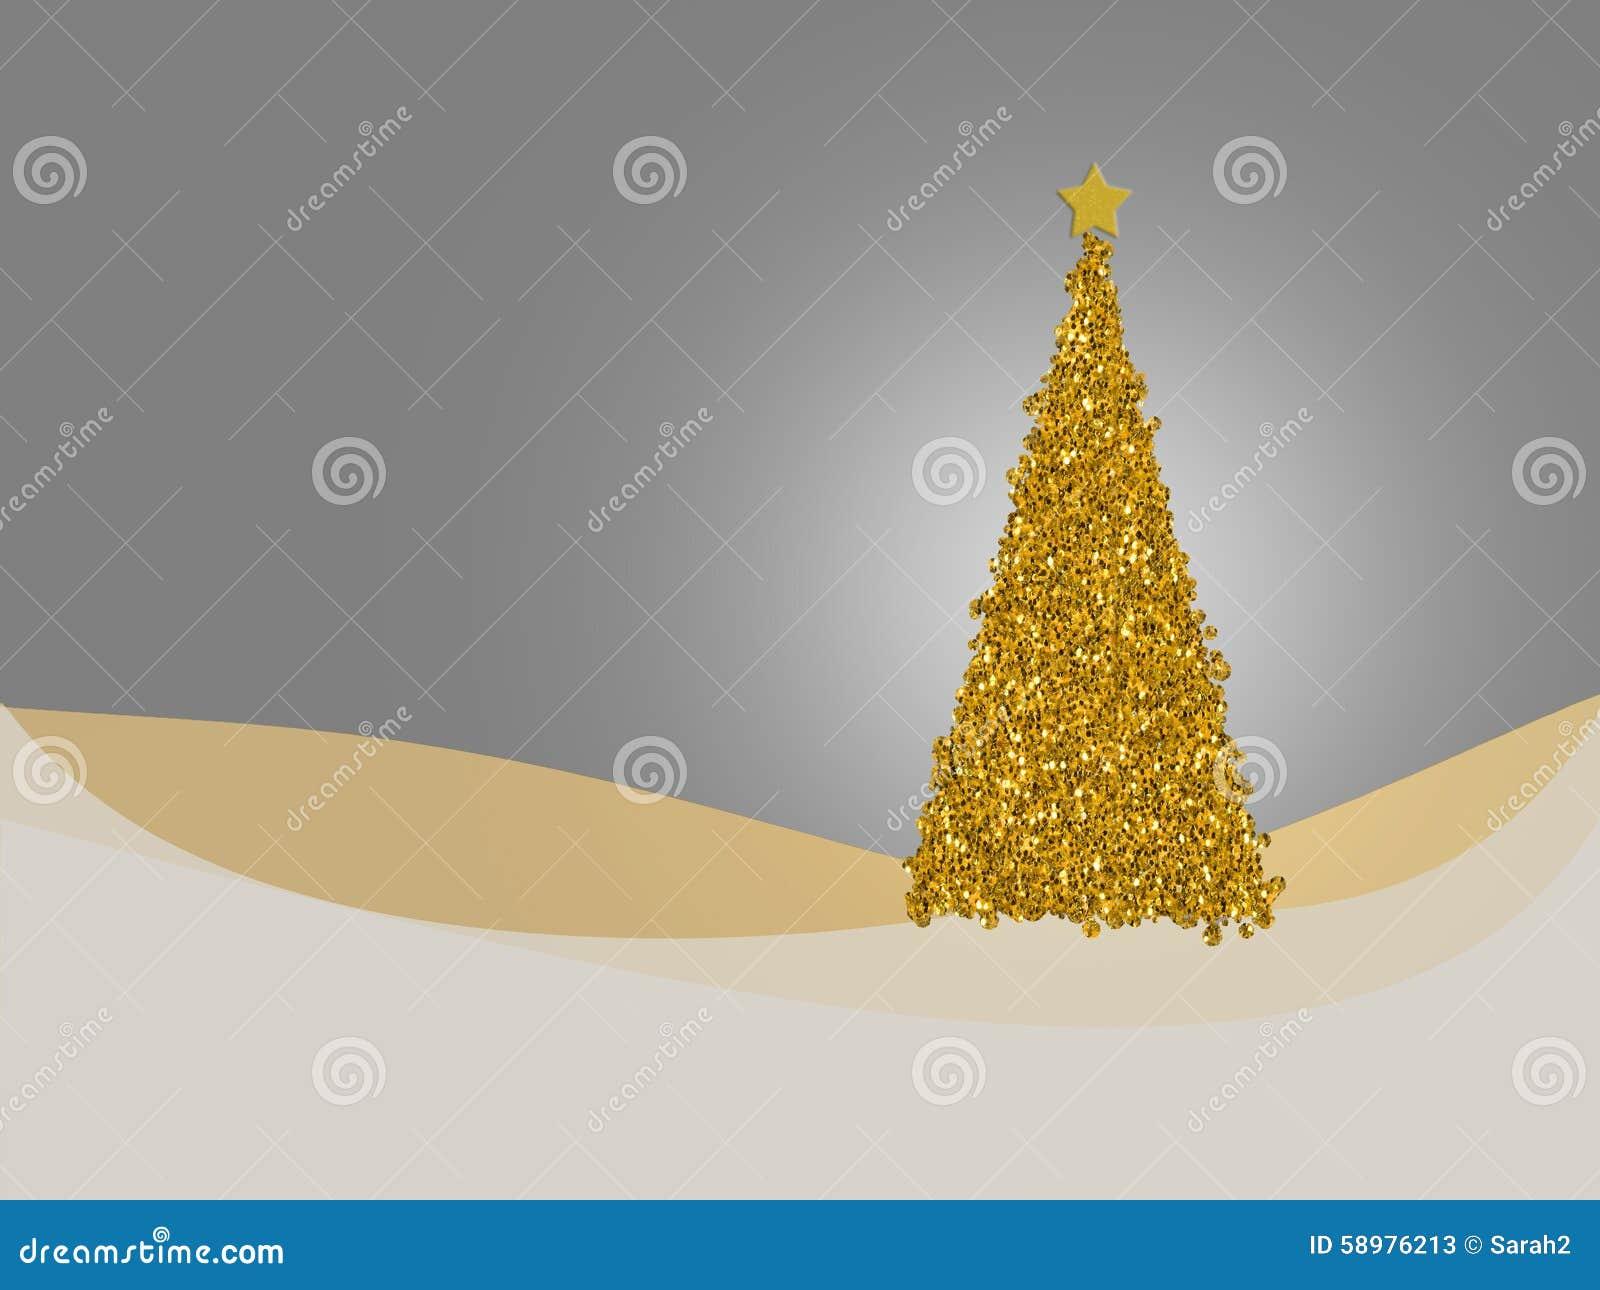 Gold And Silver Christmas Tree Card Seasonal Holiday Greetings